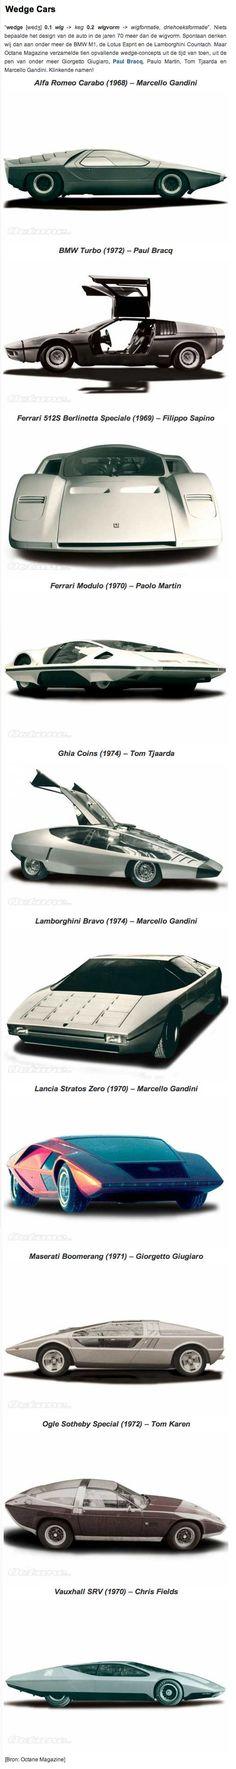 Wedge Cars Maserati, Retro Cars, Vintage Cars, Jaguar, Transport, Futuristic Cars, Automotive Design, Sexy Cars, Car Car